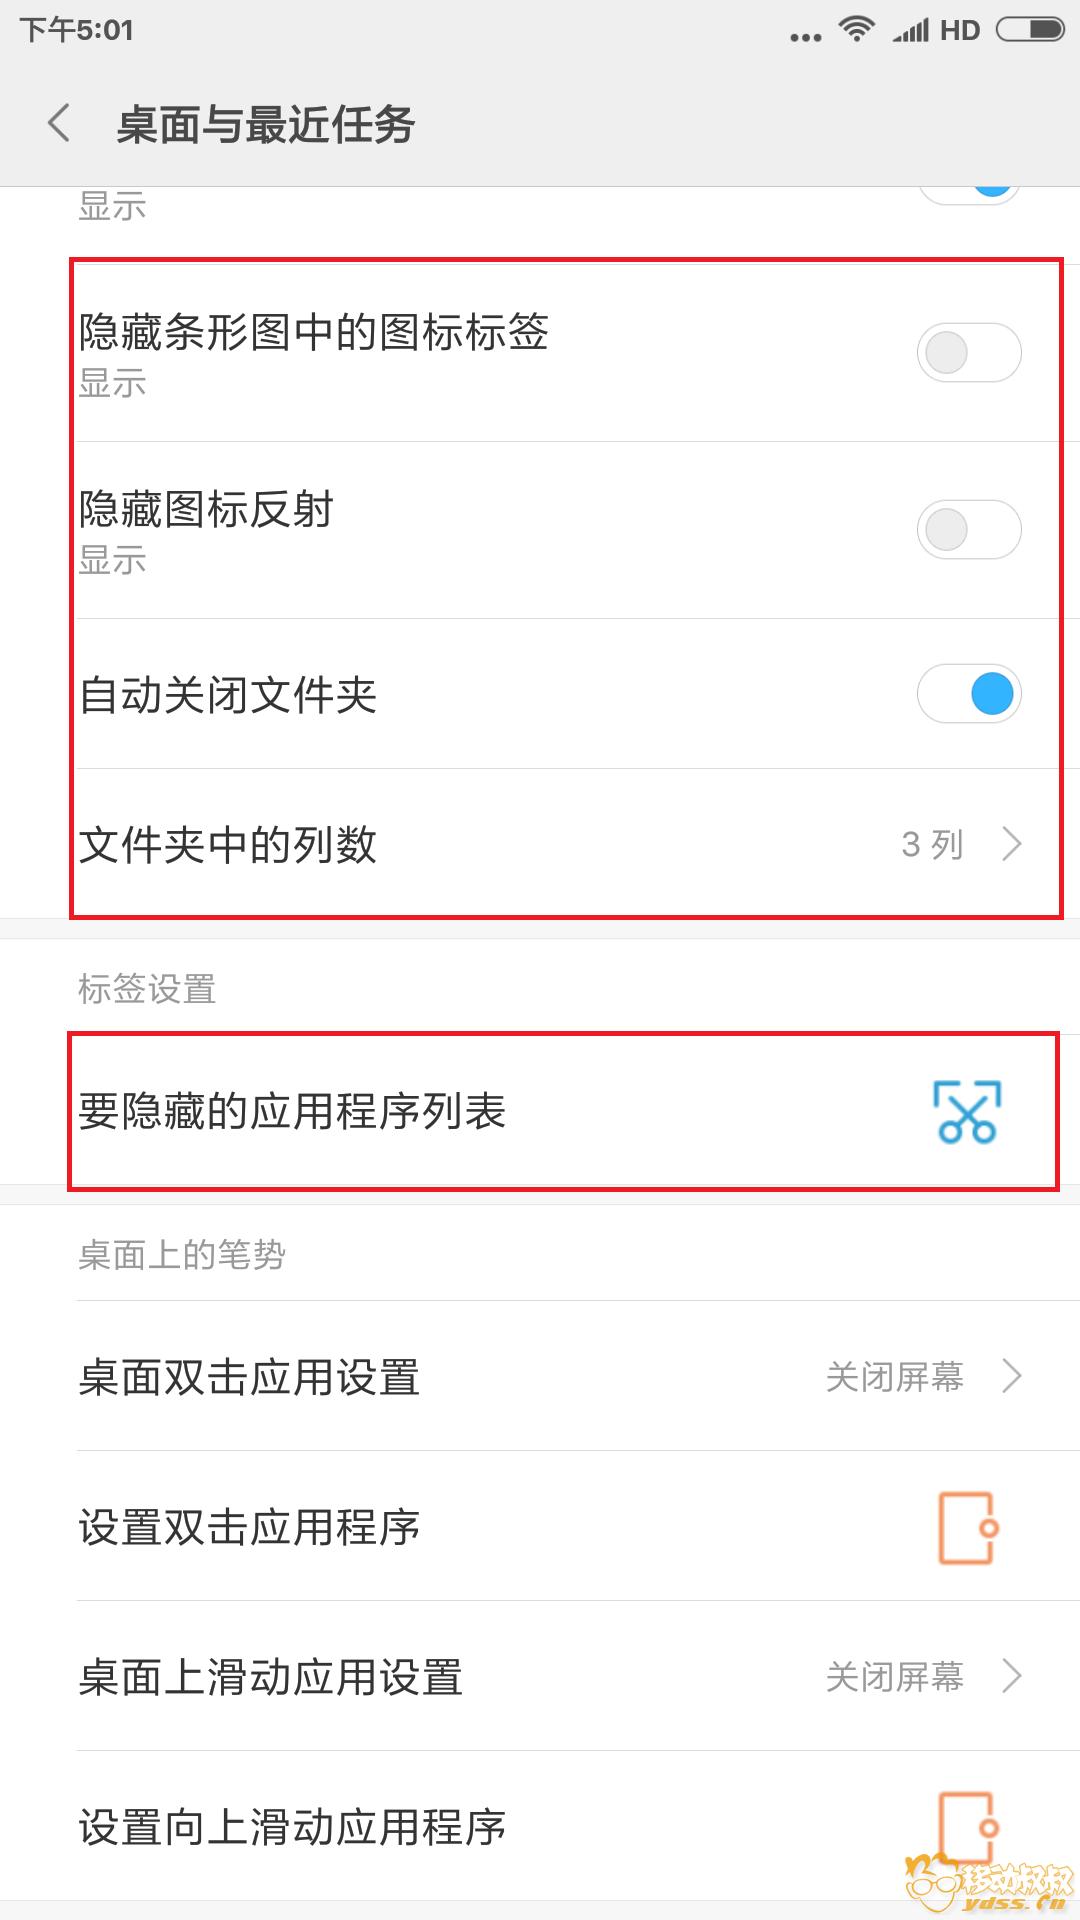 Screenshot_2018-05-19-17-01-27-632_com.android.settings.png